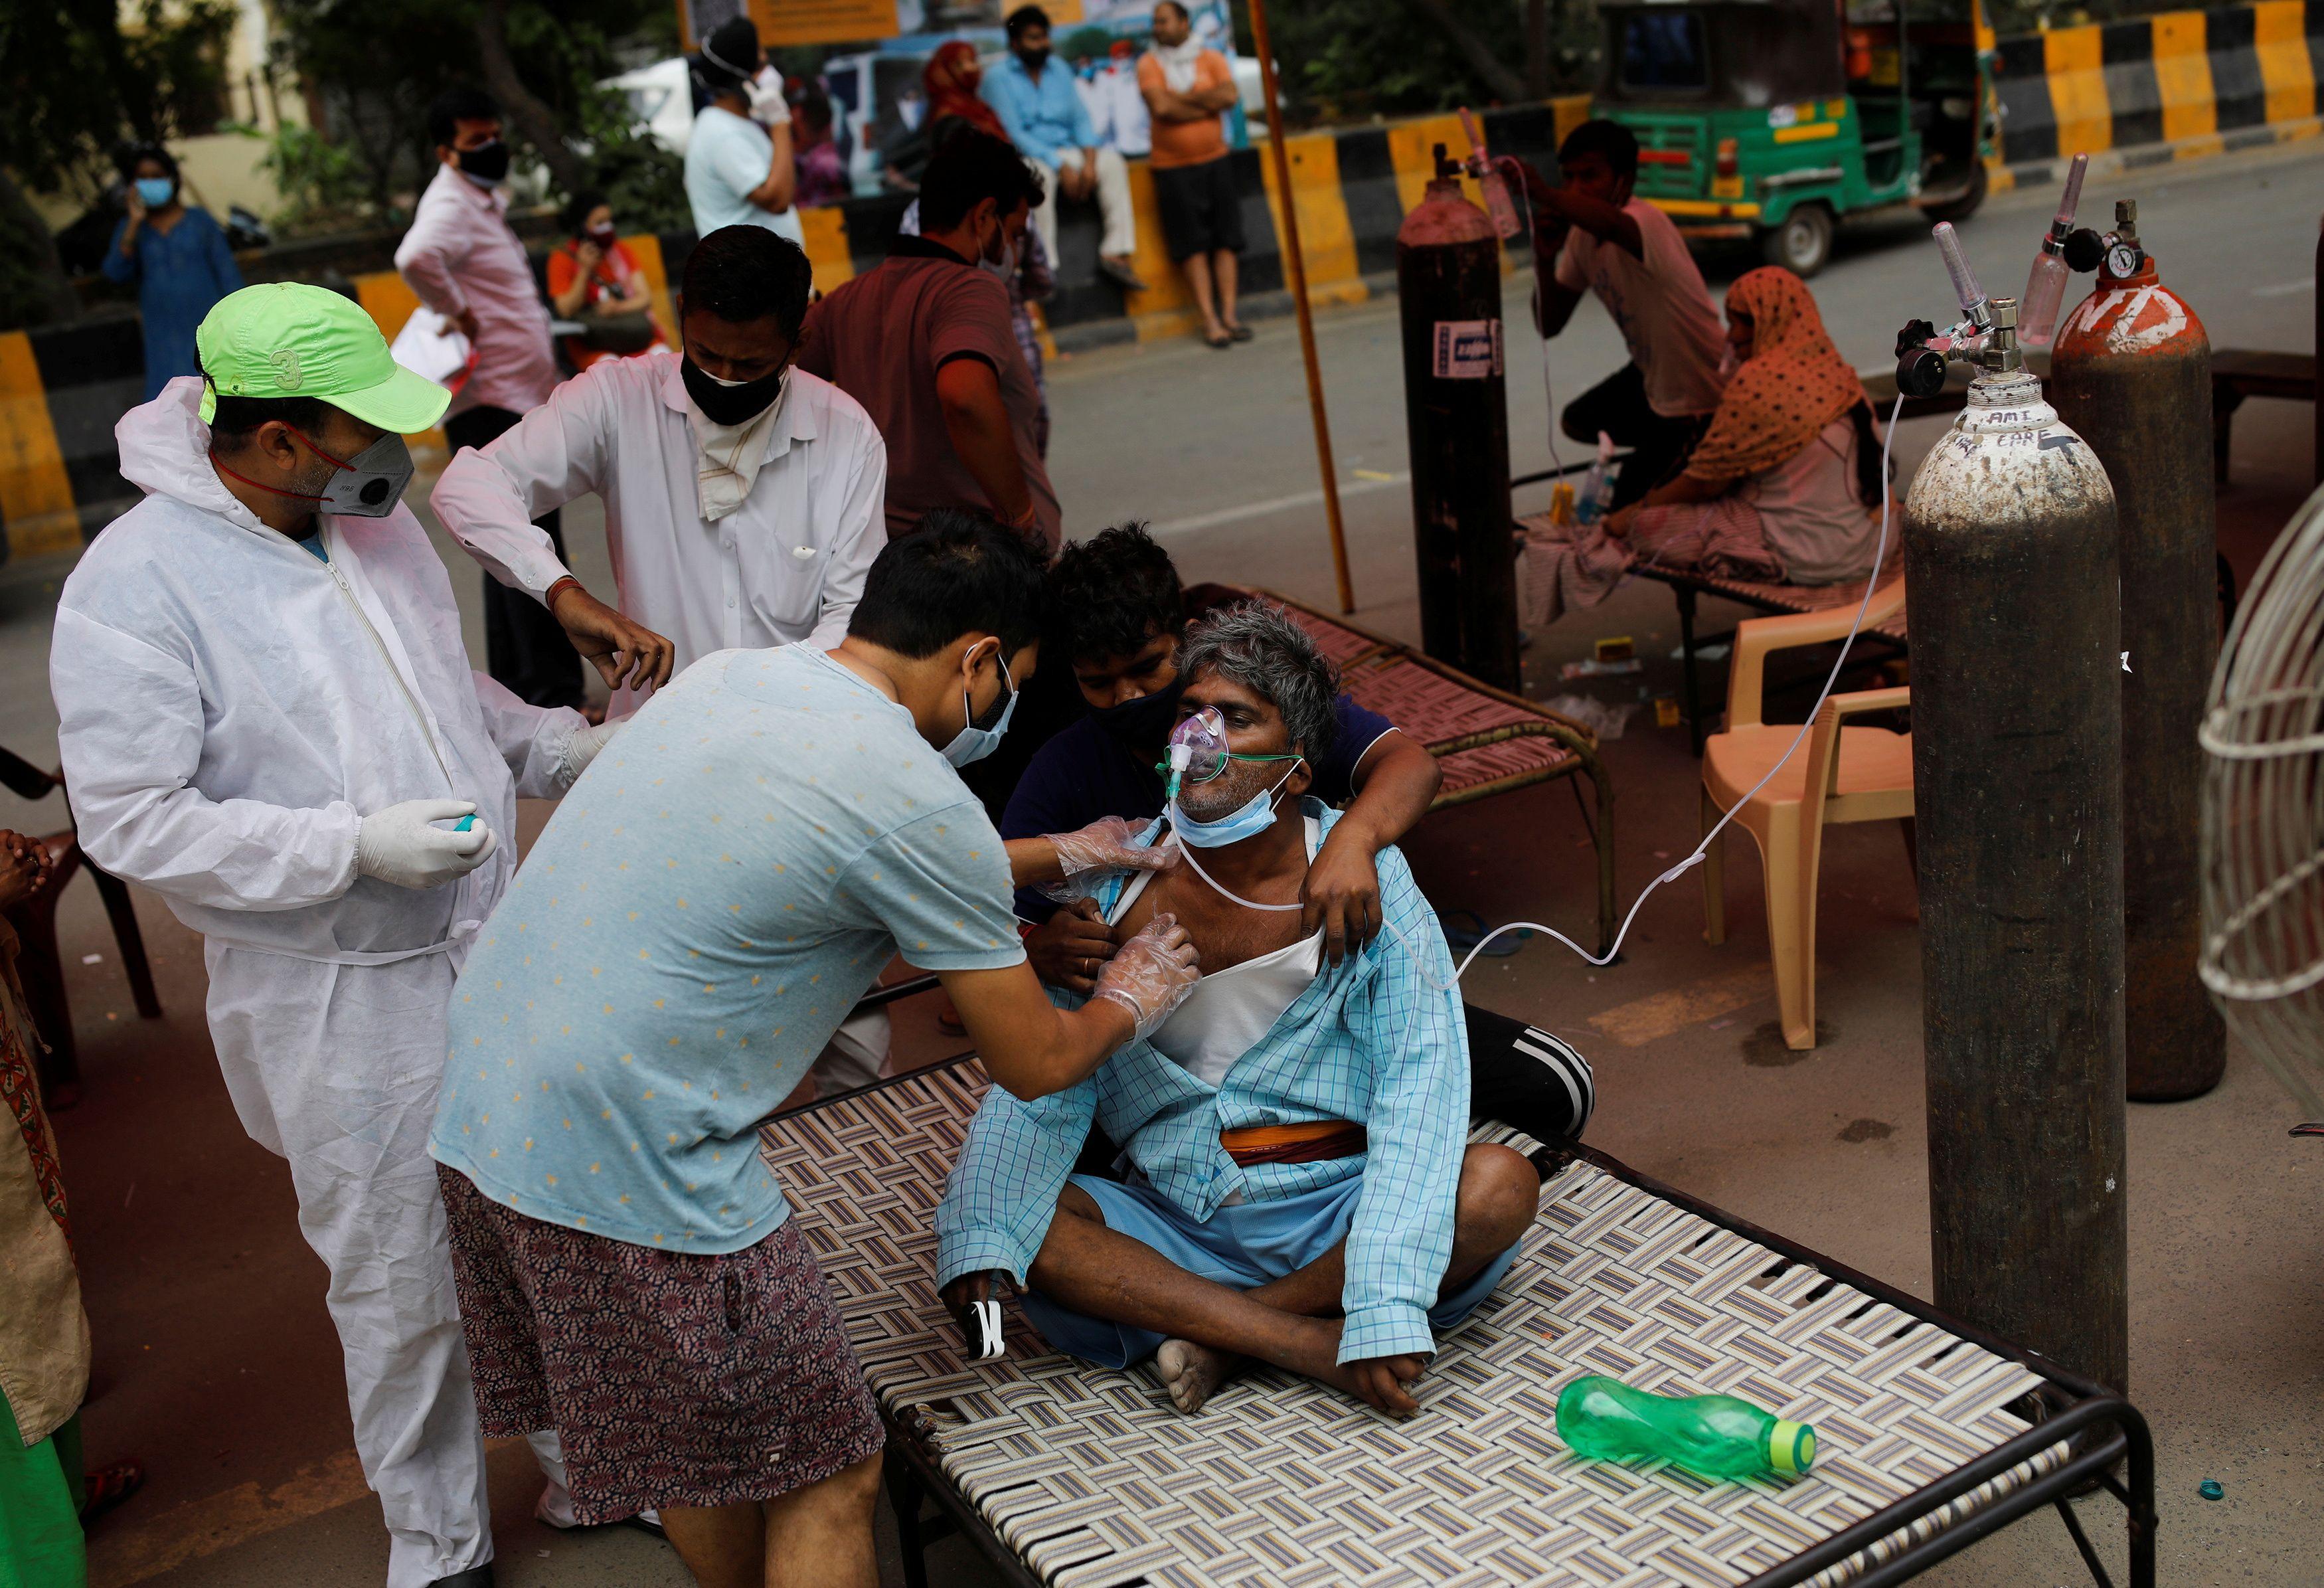 Una persona es atendida en Ghaziabad, India. REUTERS/Adnan Abidi